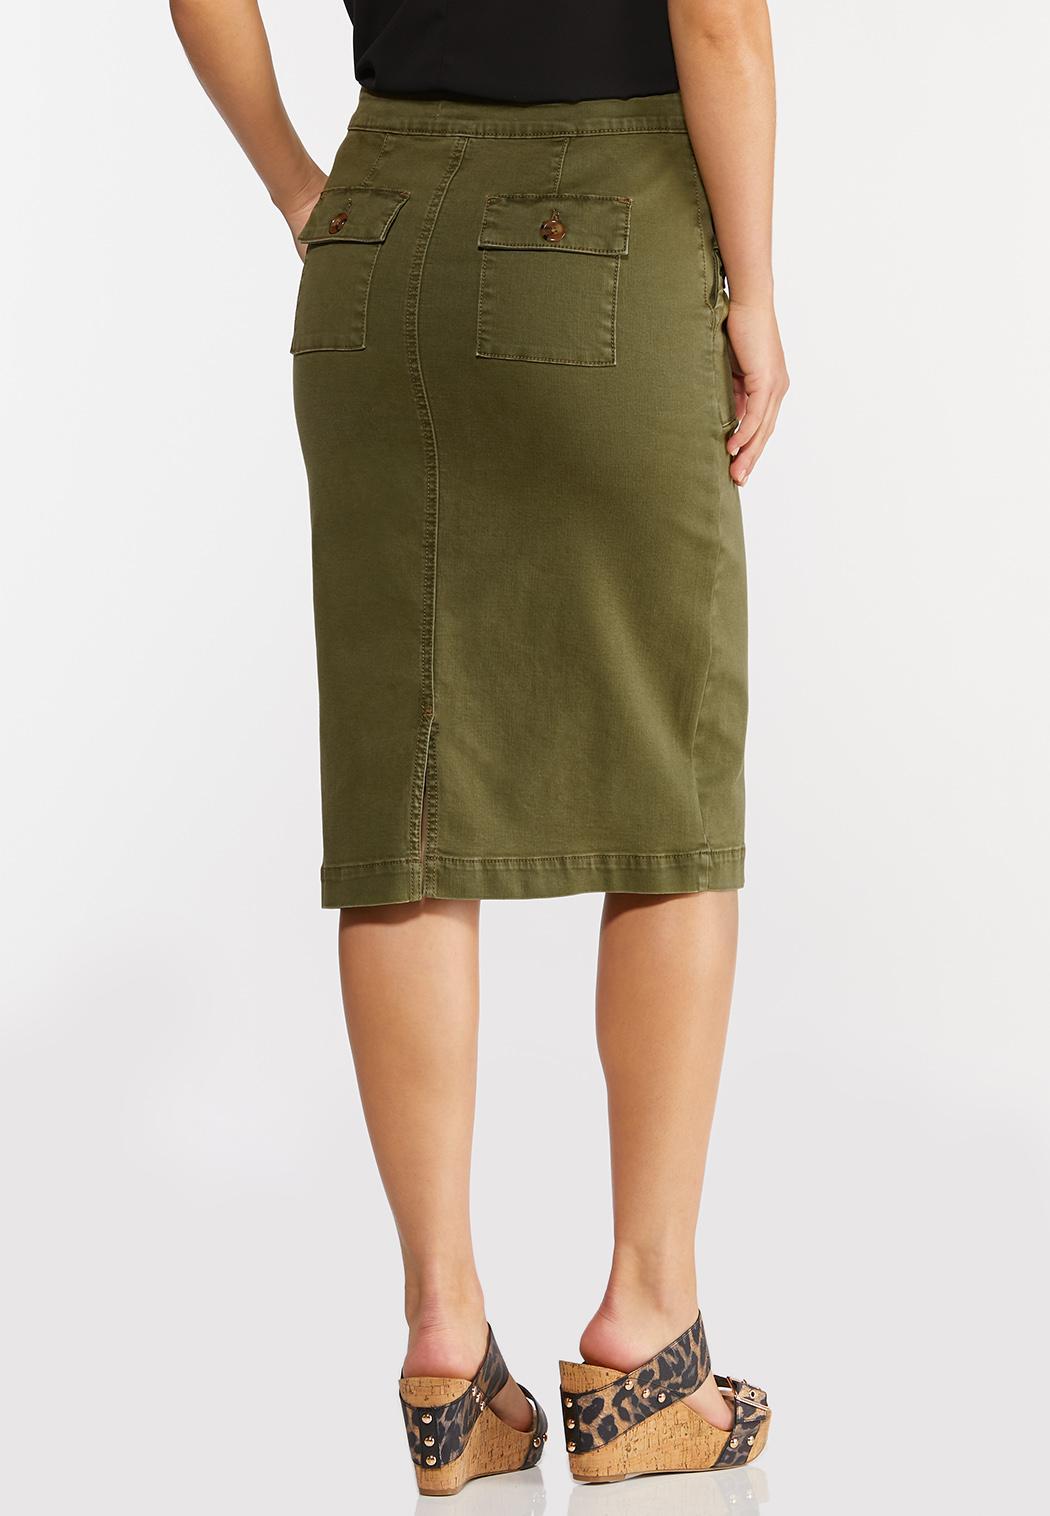 Green Pencil Skirt (Item #44296933)